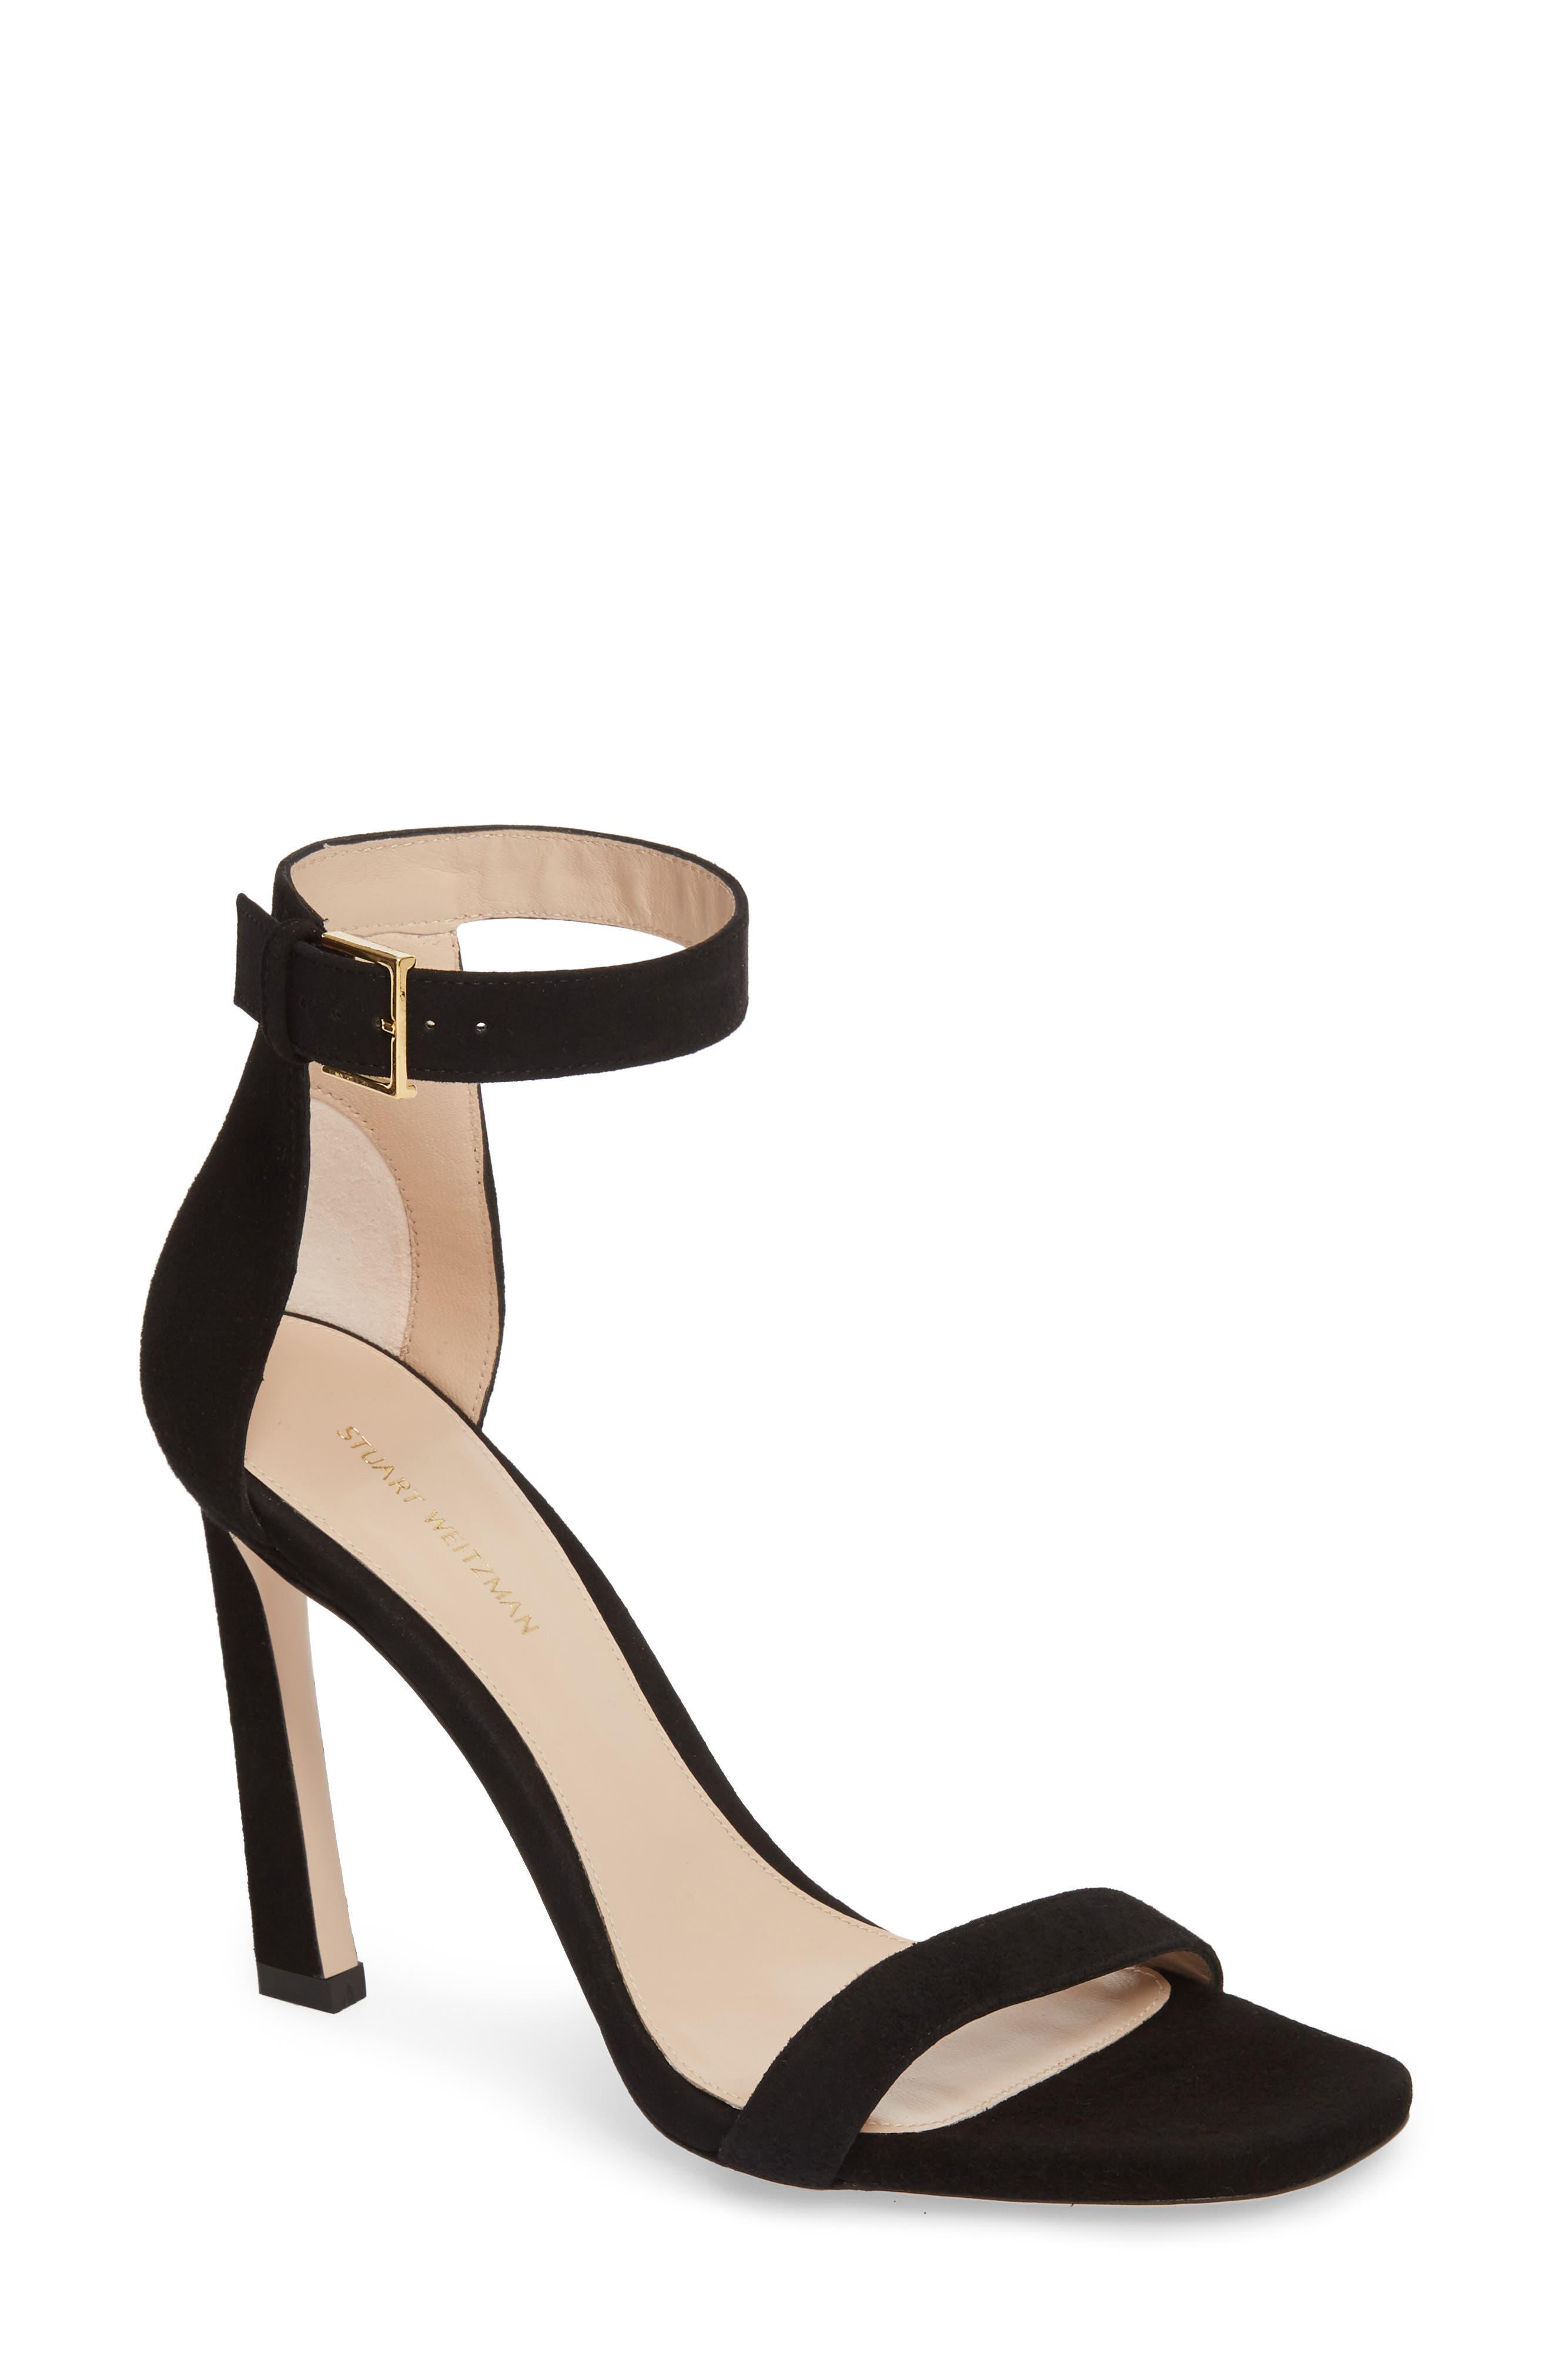 100SQUARENUDIST Sandal,                         Main,                         color, Black Seda